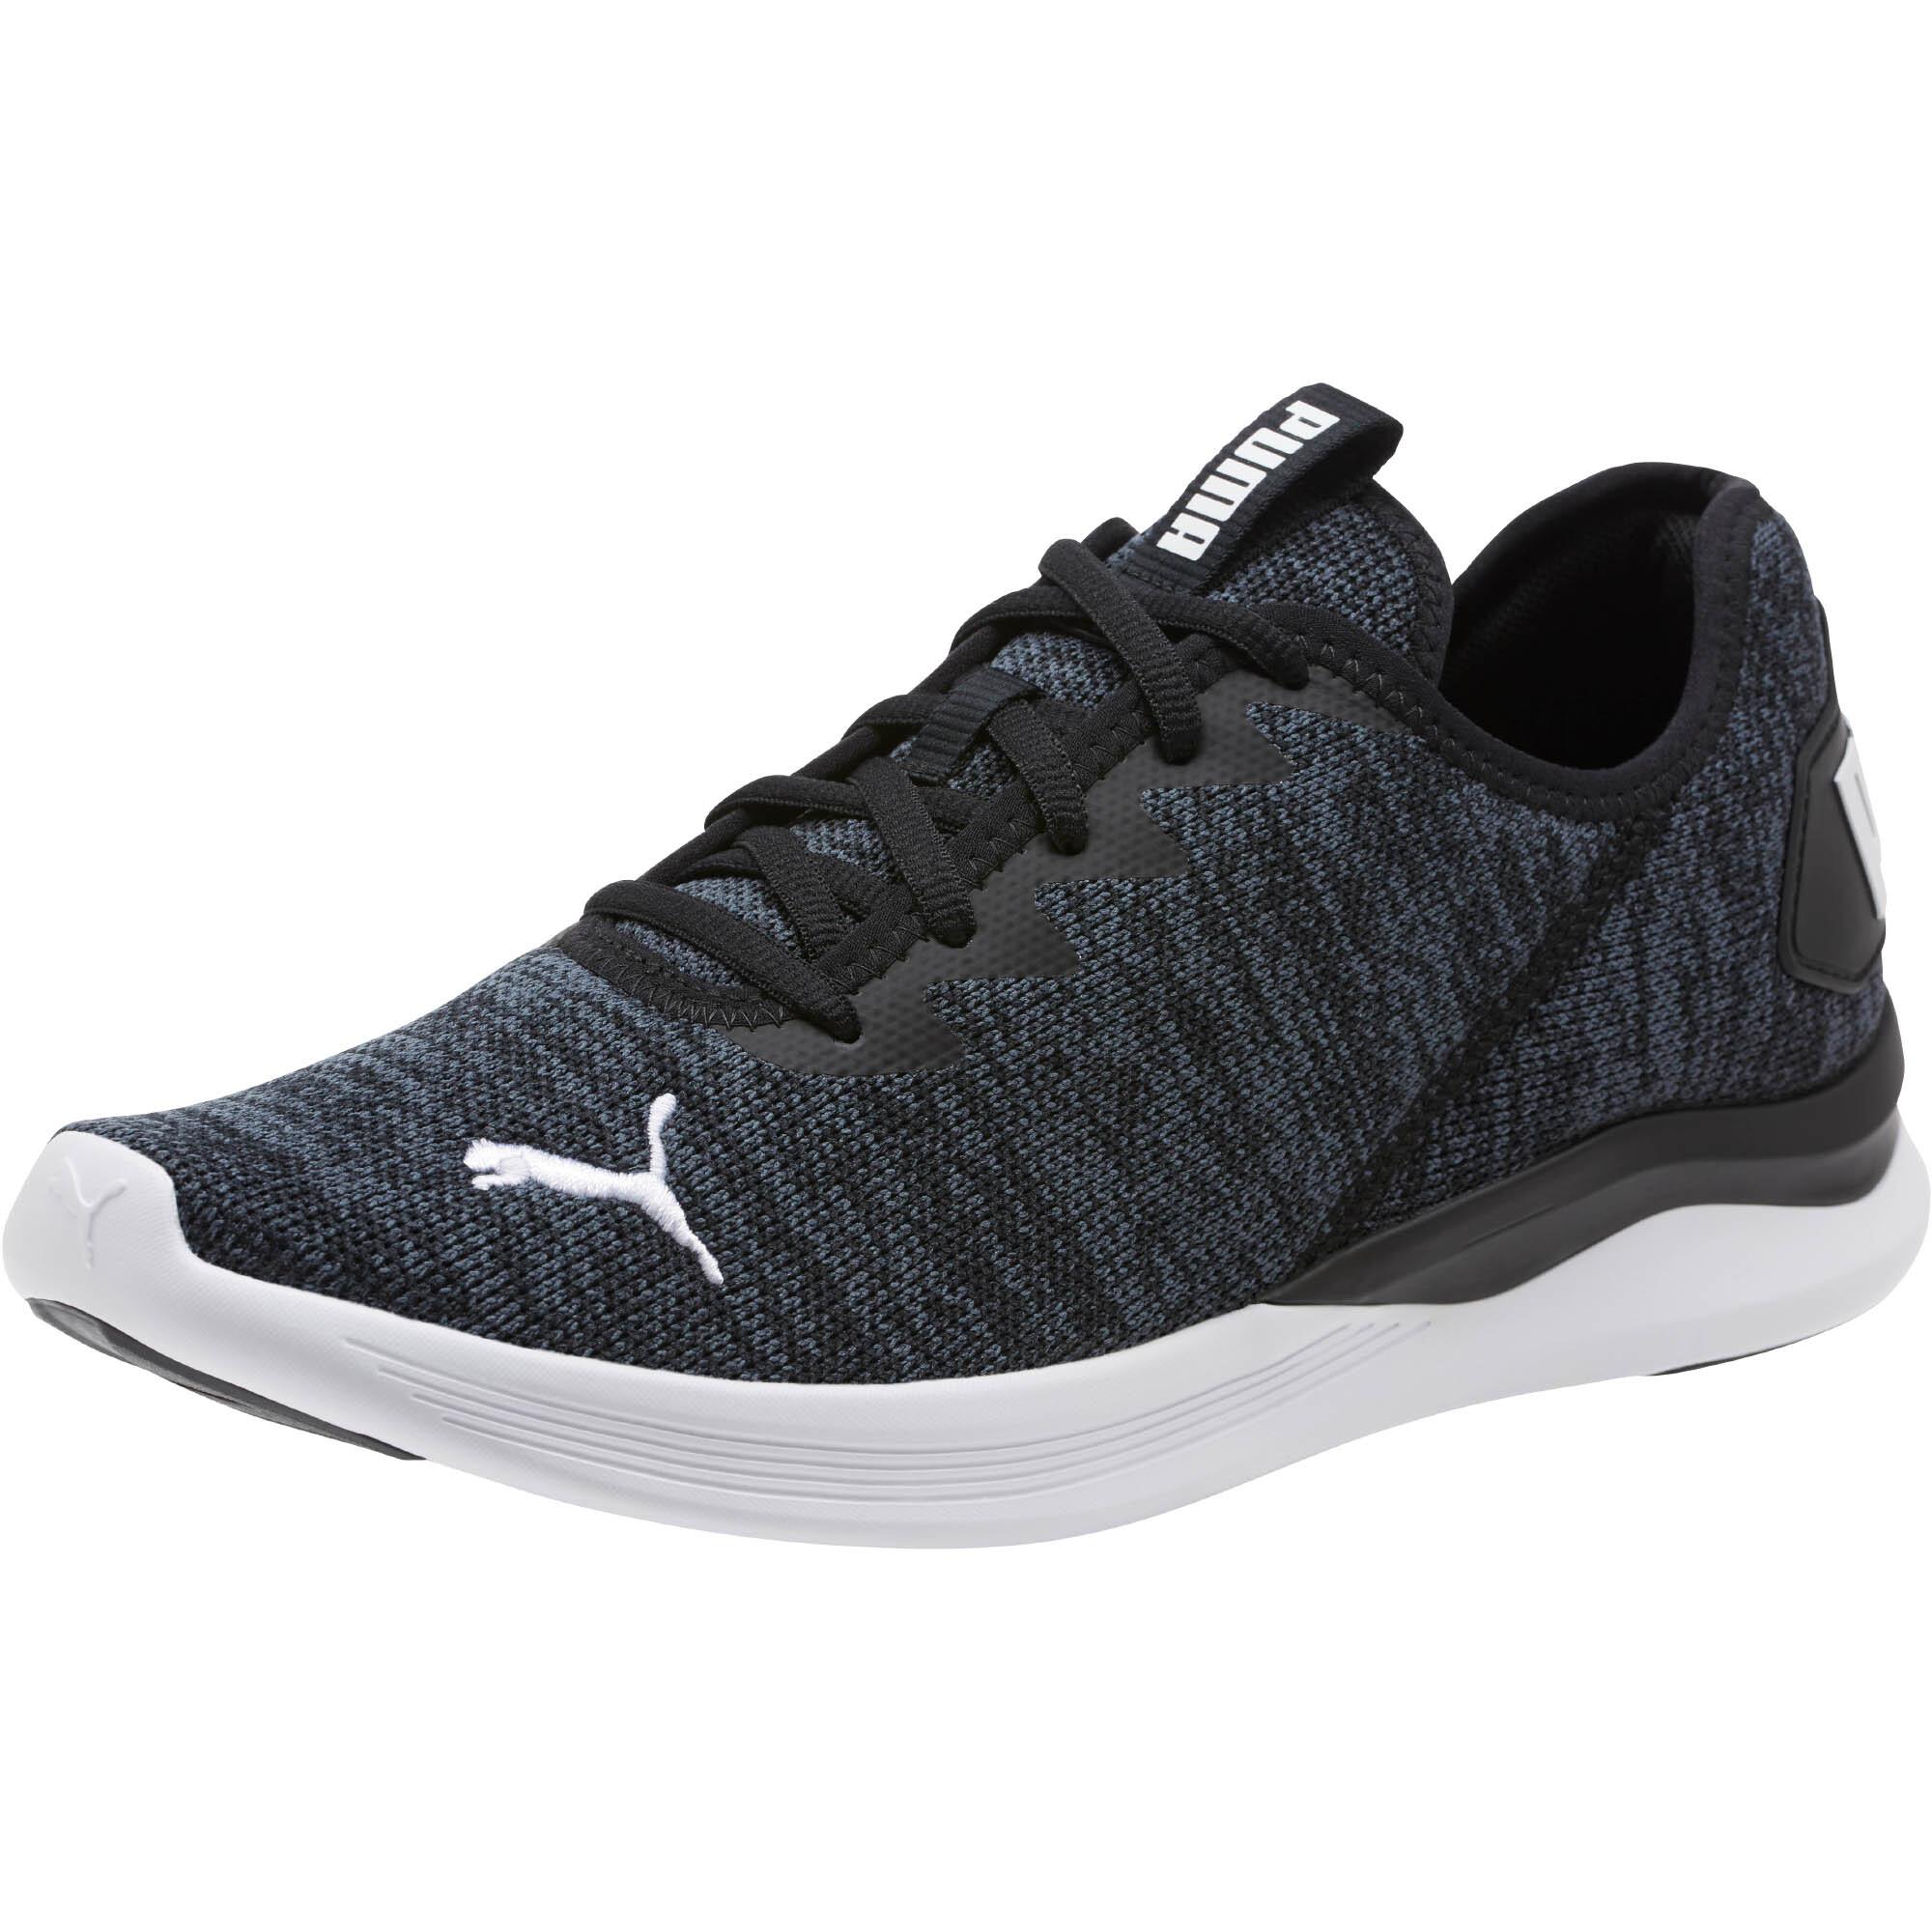 PUMA-Ballast-Men-039-s-Running-Shoes-Men-Shoe-Running thumbnail 11